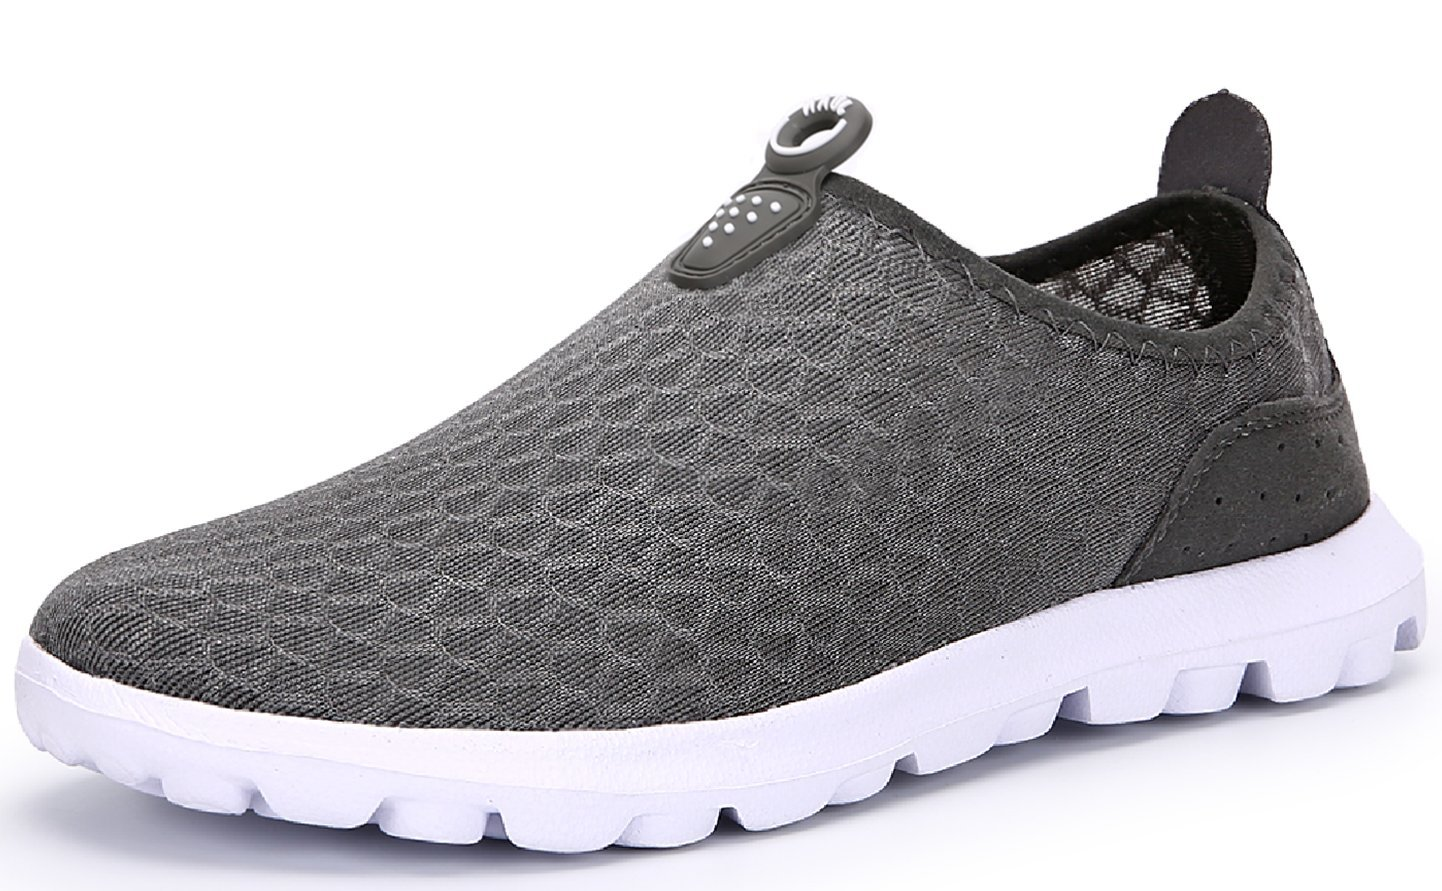 JUAN Men's New Light Weight Go Easy Mesh Walking Shoes Casual Athletic Comfortable Running Sneakers (45 M EU / 11 D(M) US, Grey)